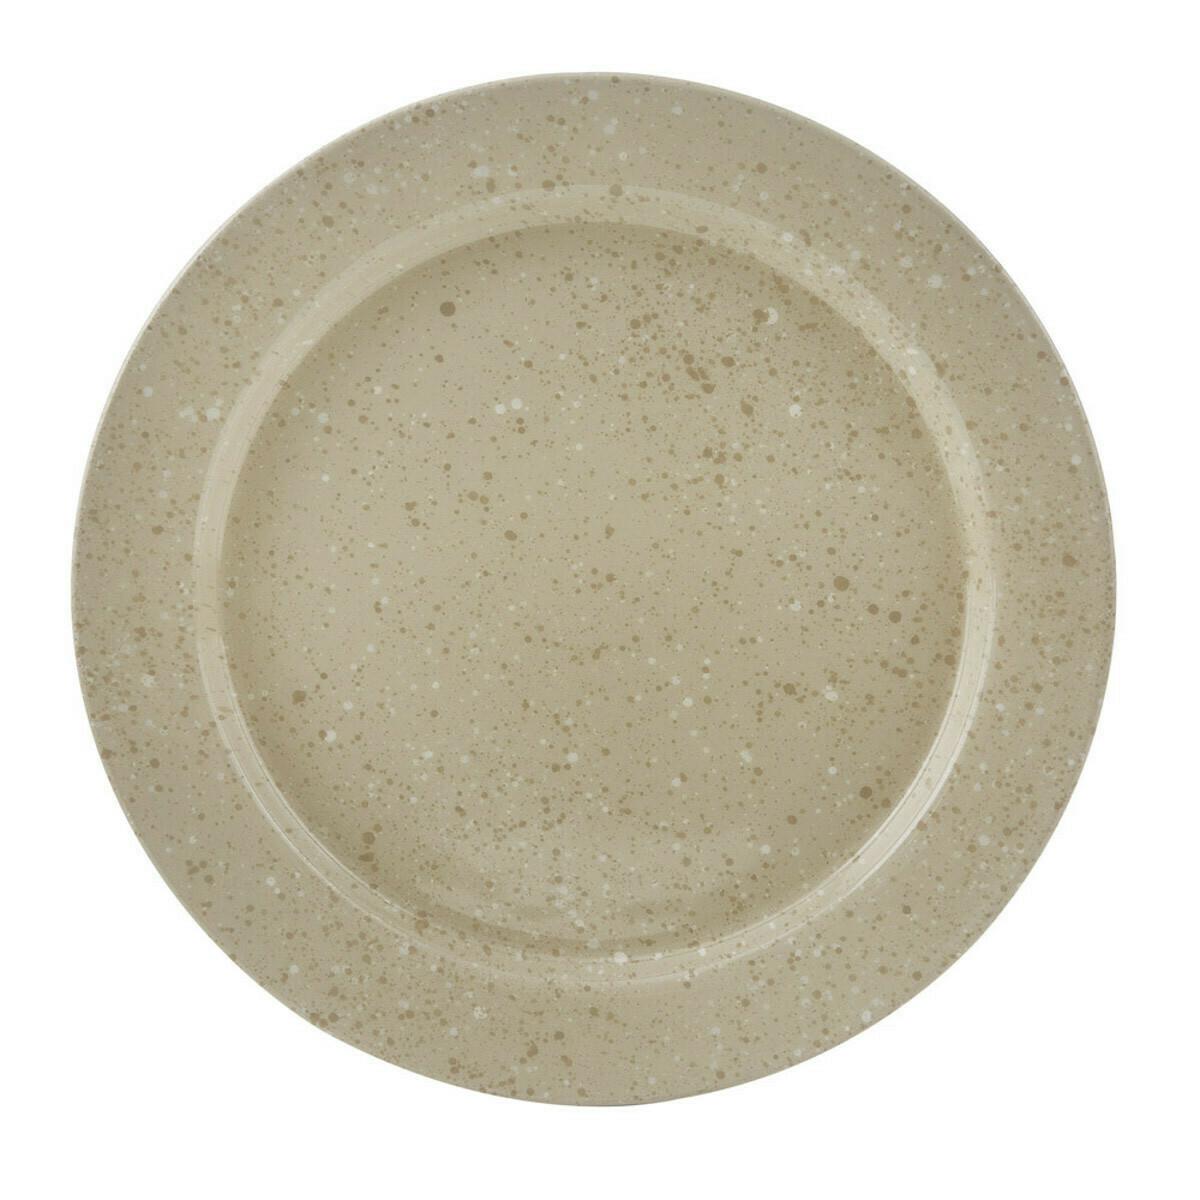 Granite Enamelware Sandstone Dinner Plate